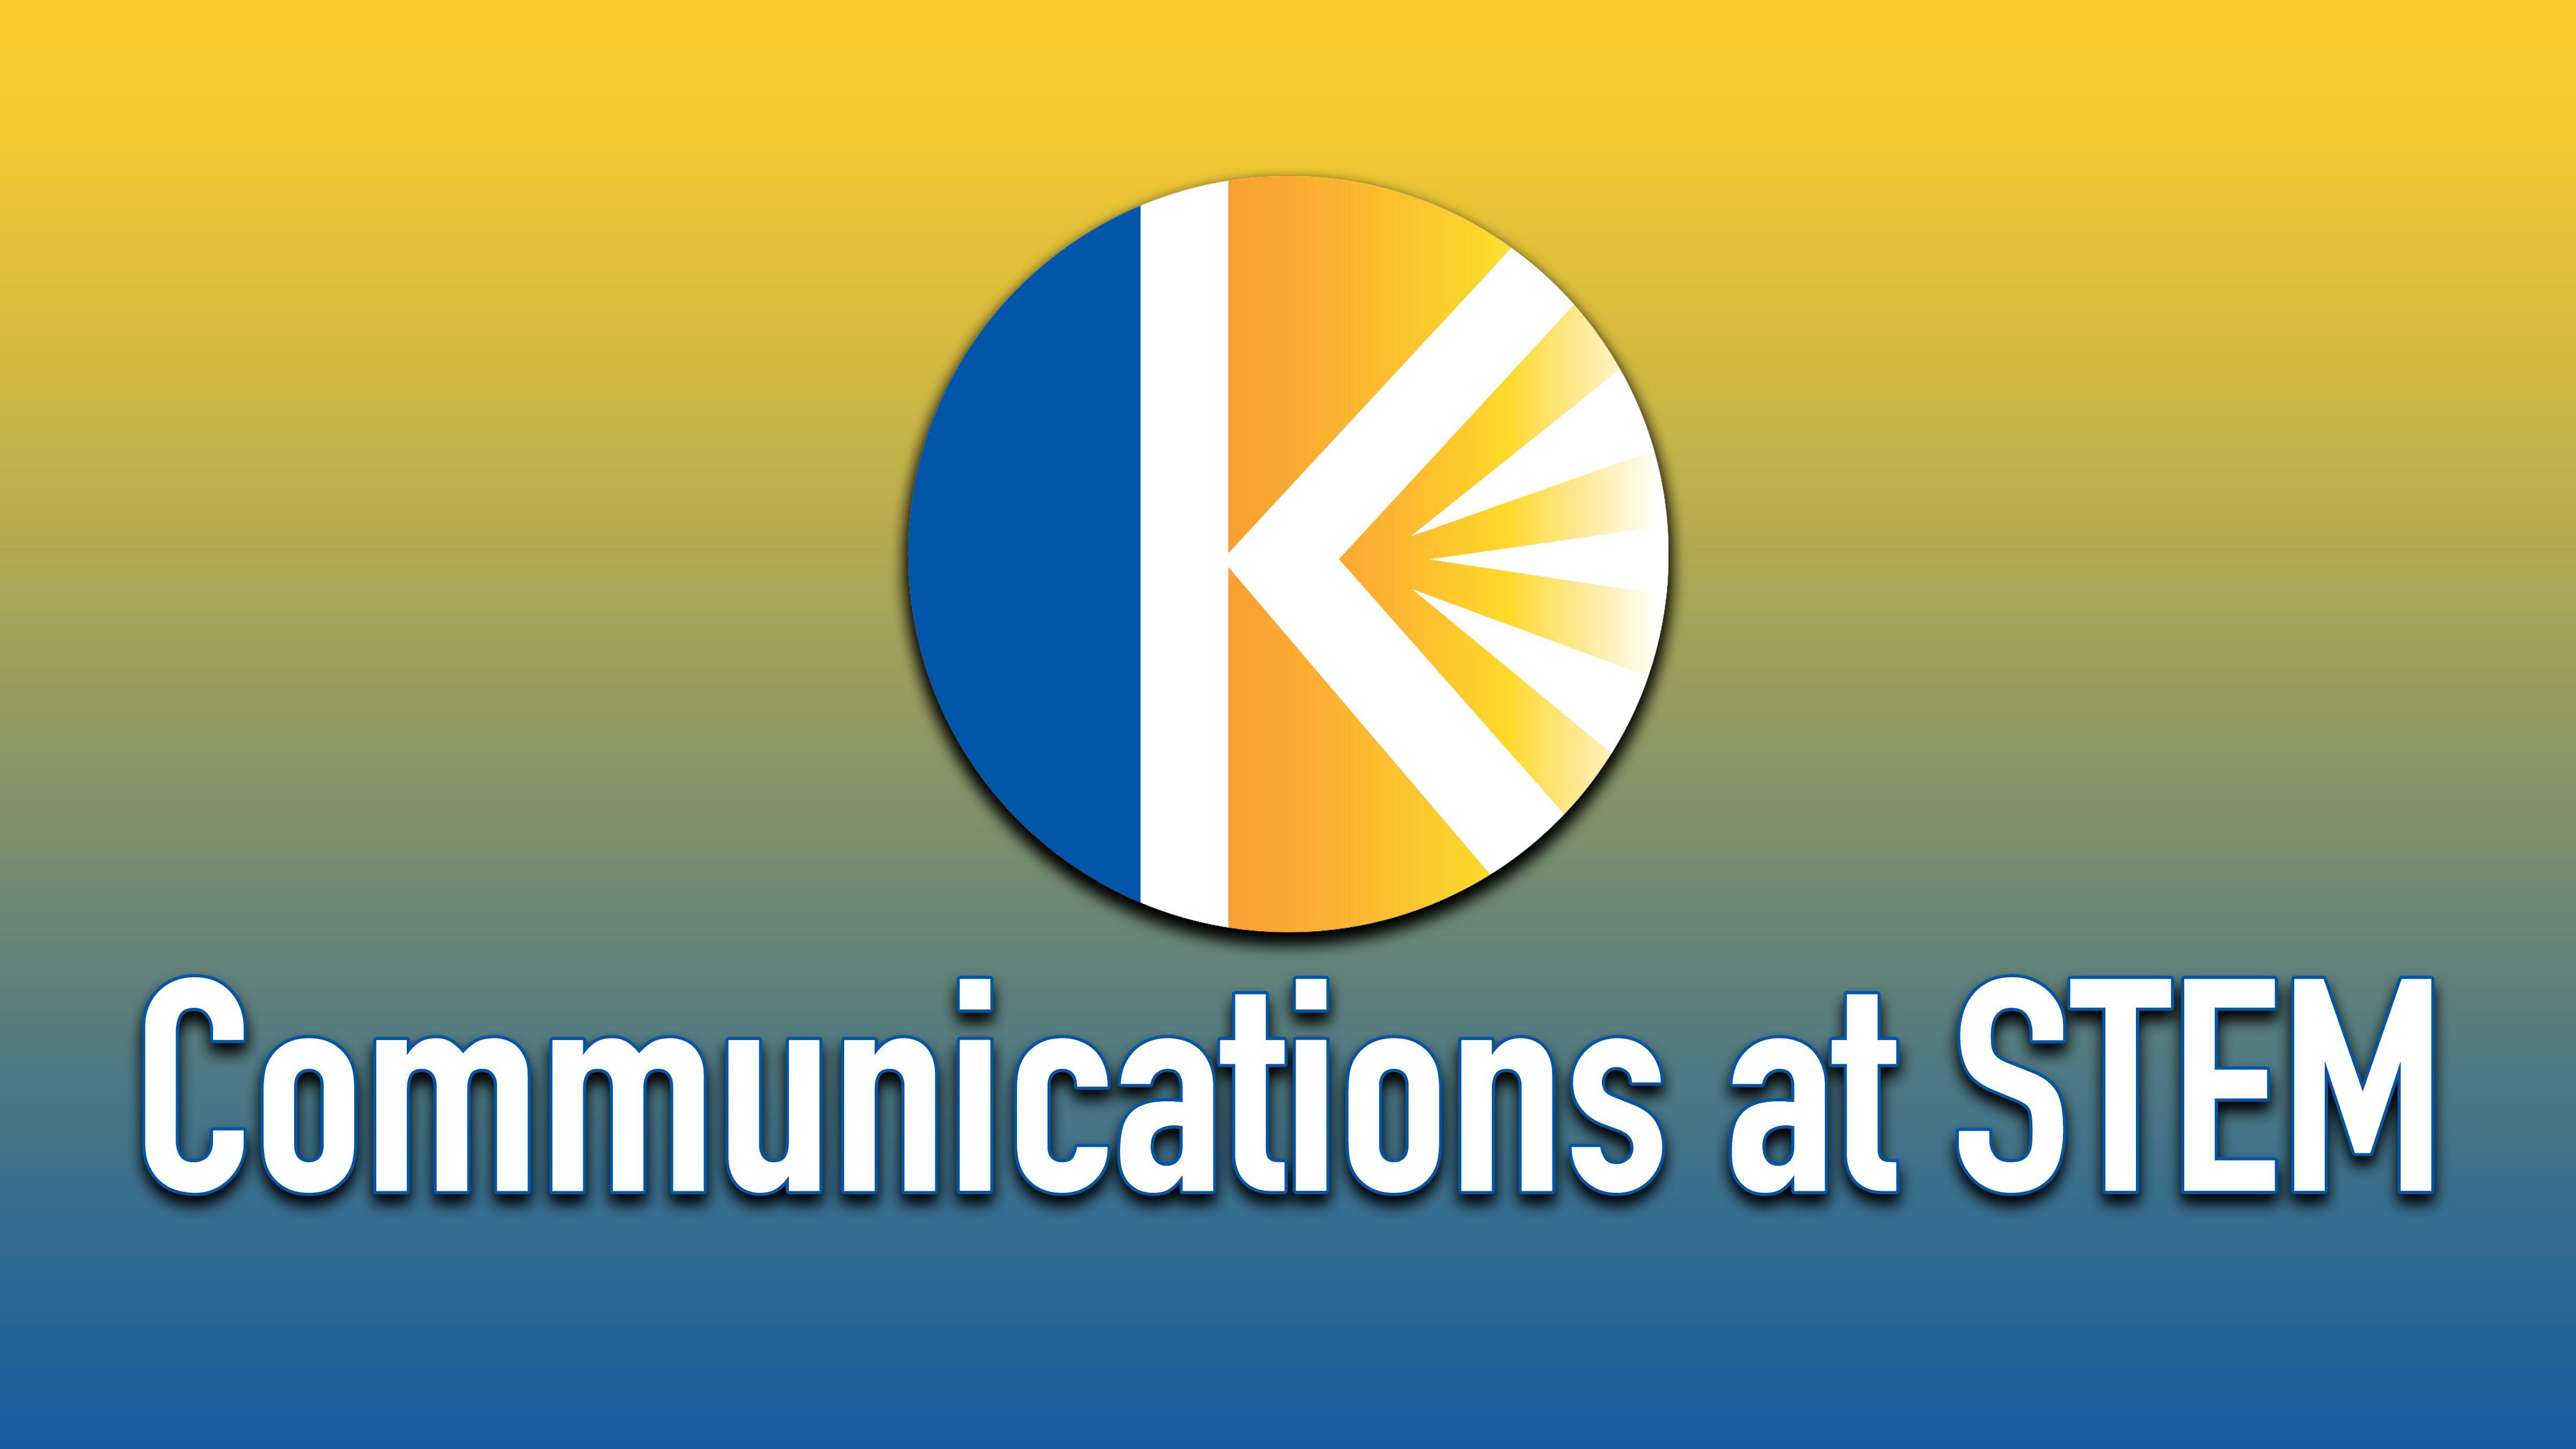 Communications at STEM